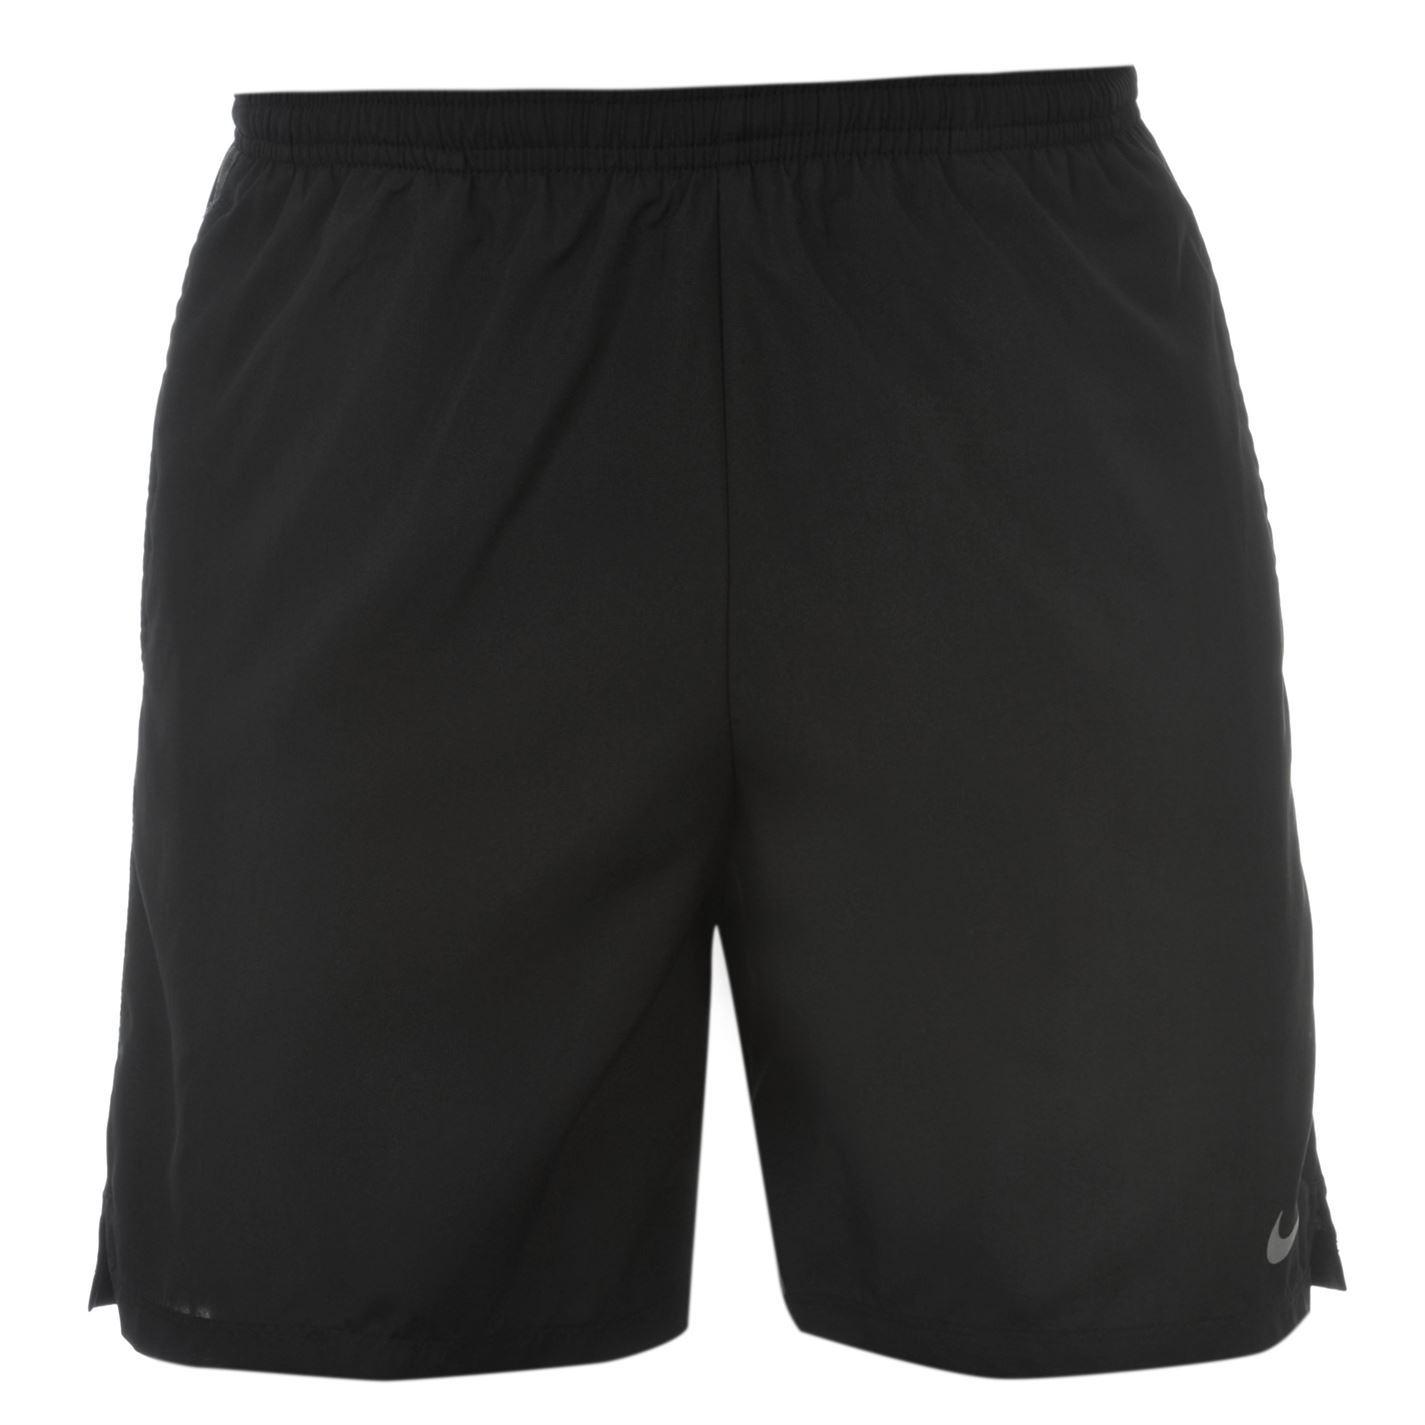 nike dri fit 7 inch challenge mens running shorts black grey jogging sportswear ebay